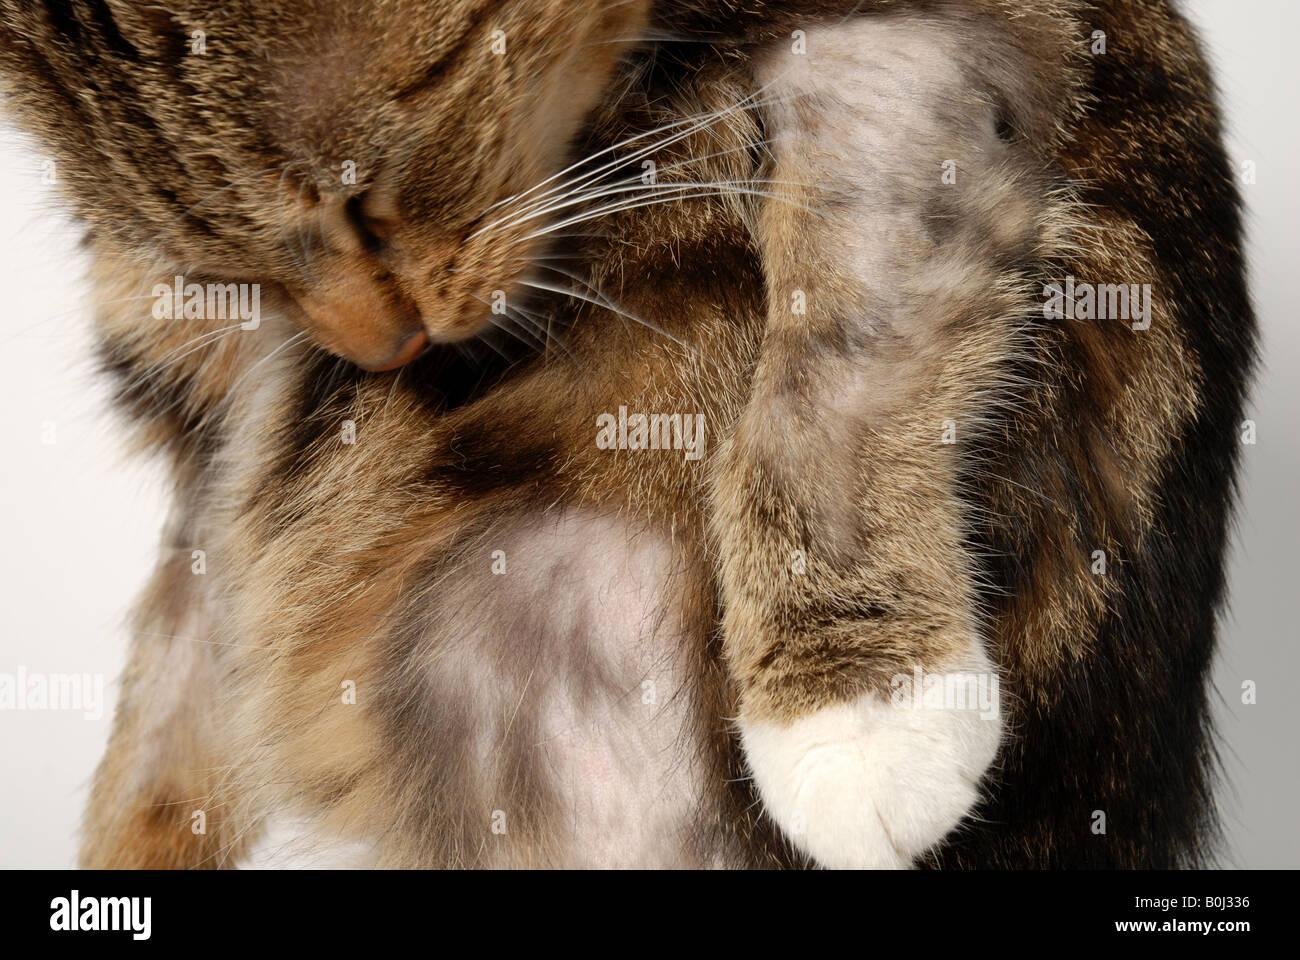 Cat miliary dermatitis photos M: Customer reviews: Virbac Keratolux